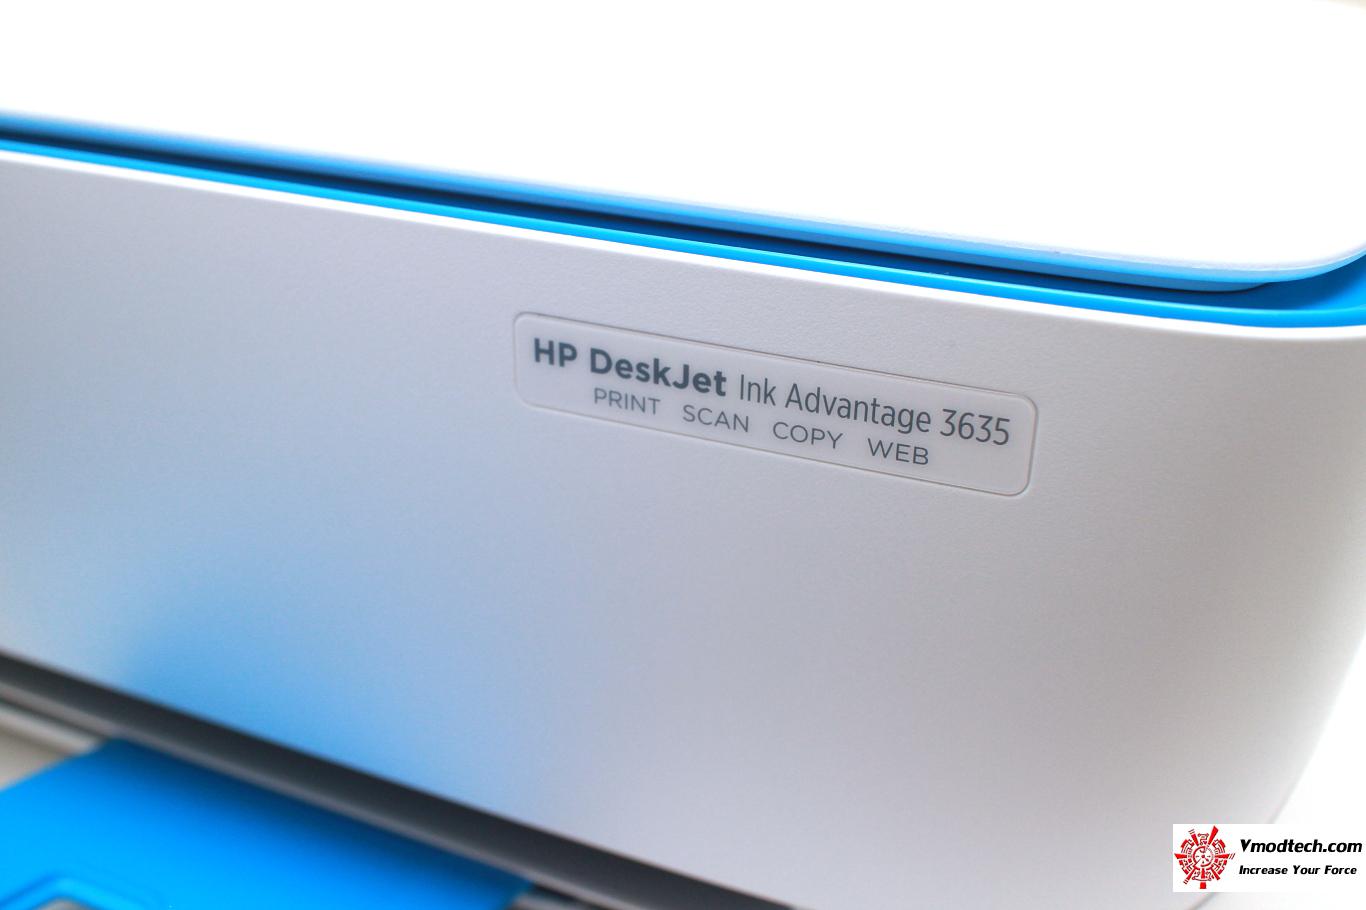 img 6832 HP Deskjet Ink Advantage 3635